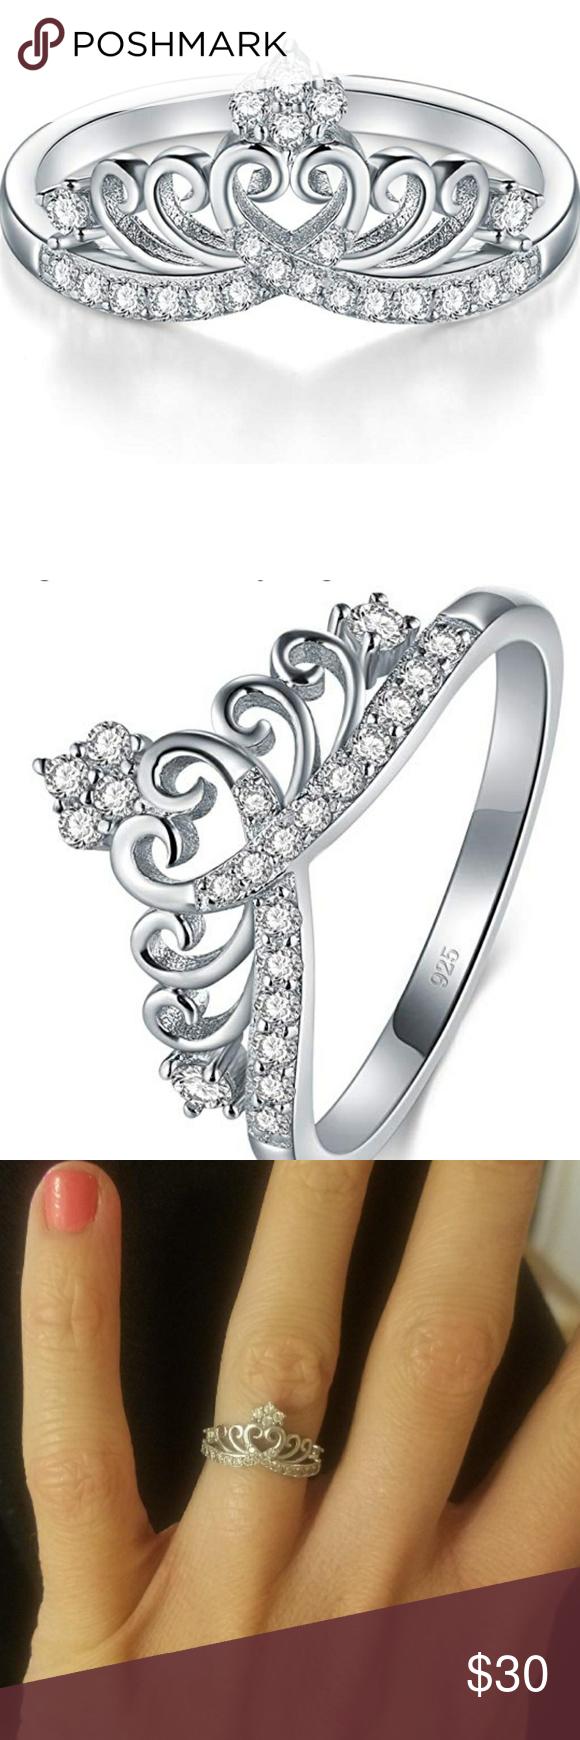 925 Sterling Silver Princess Crown ring Beautiful crown